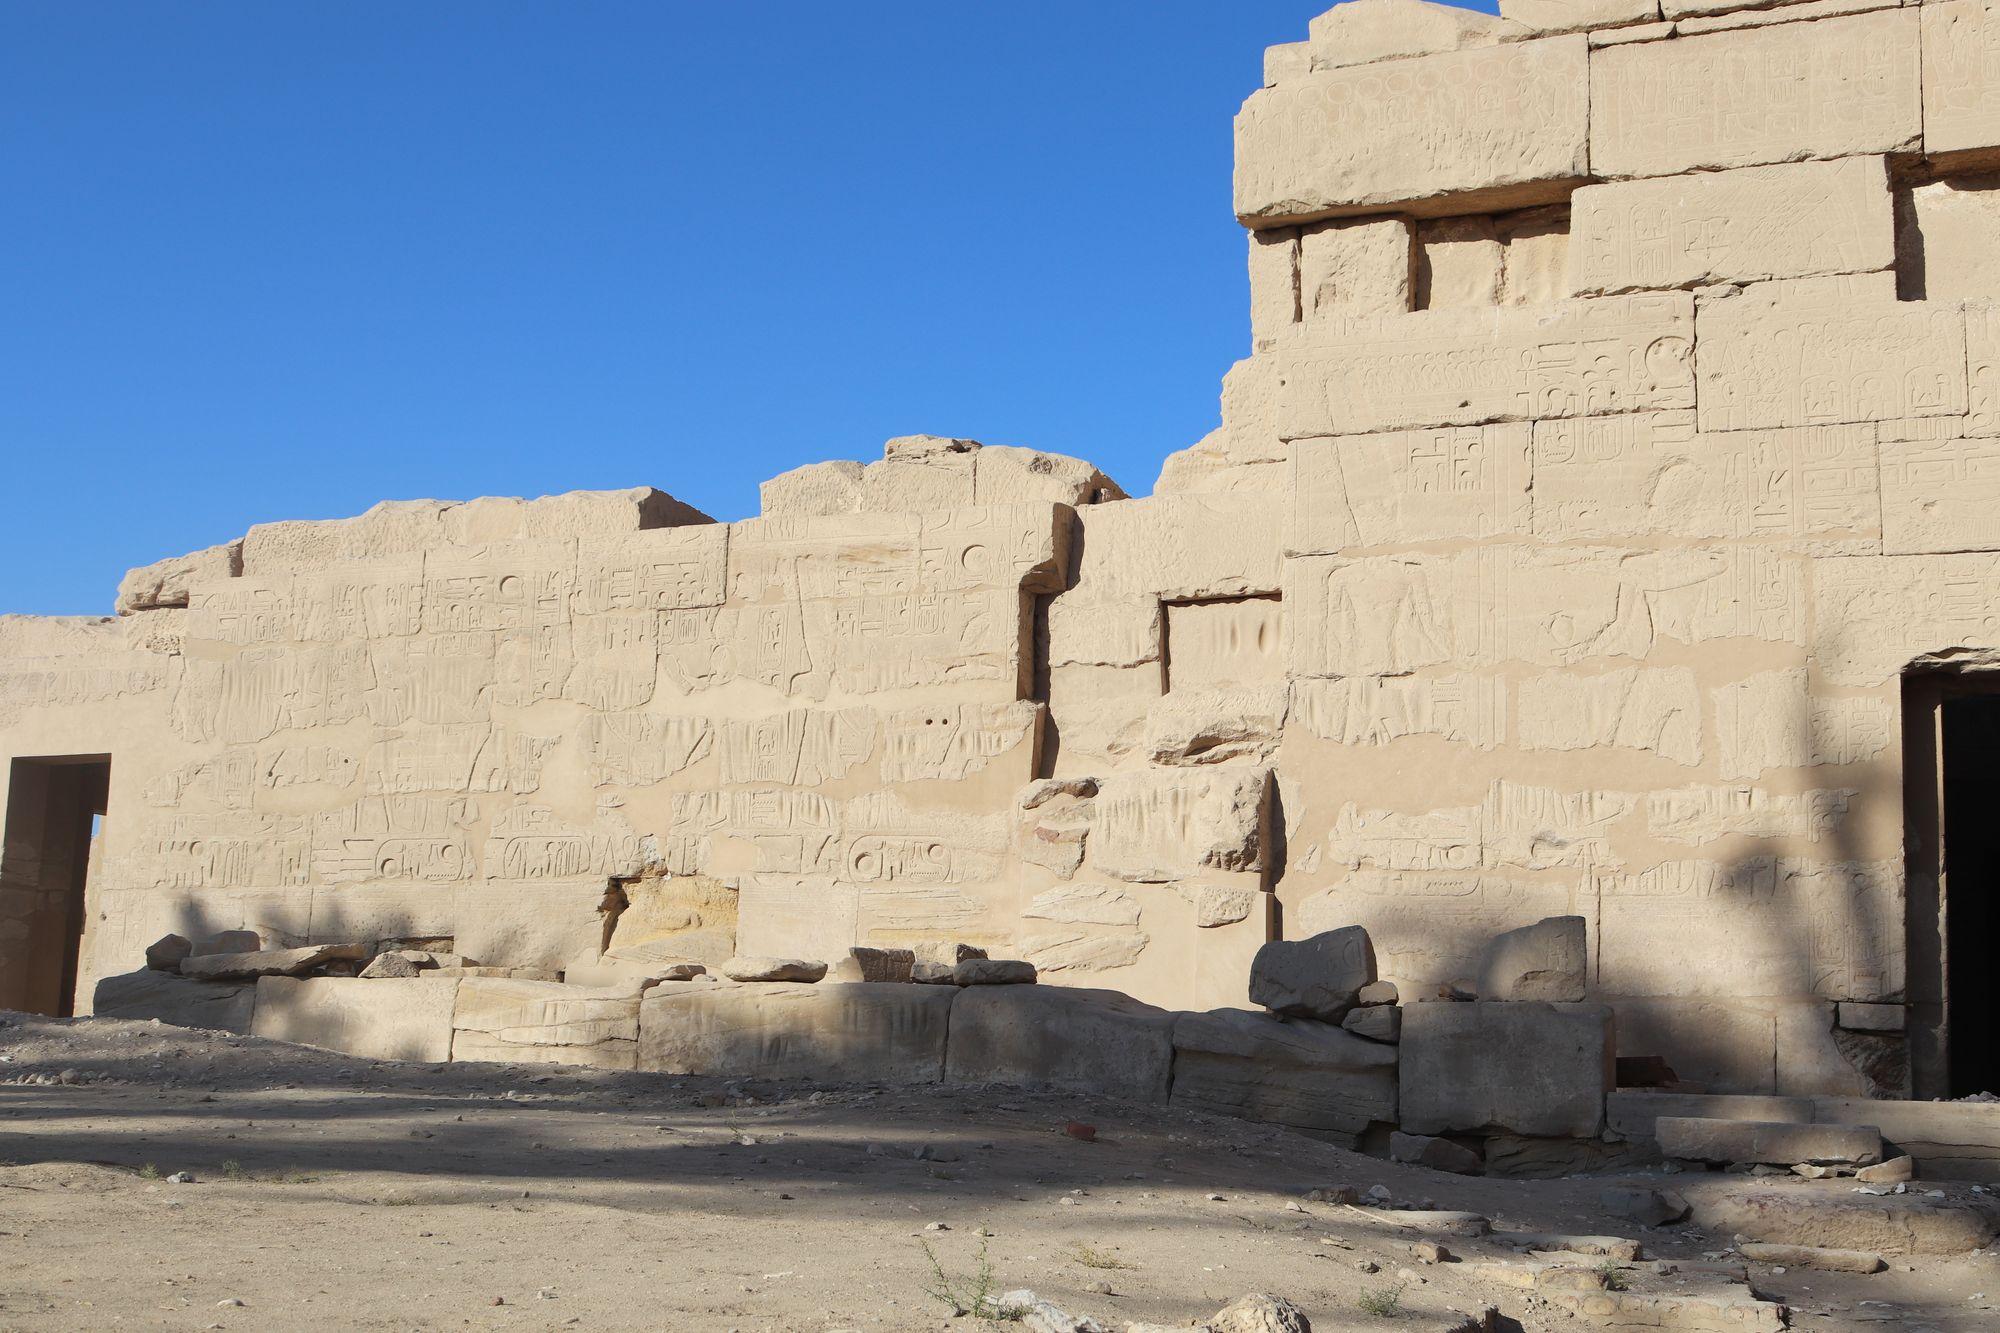 Antiguo Egipto - Templo de Seti I en Qurna - Egiptología